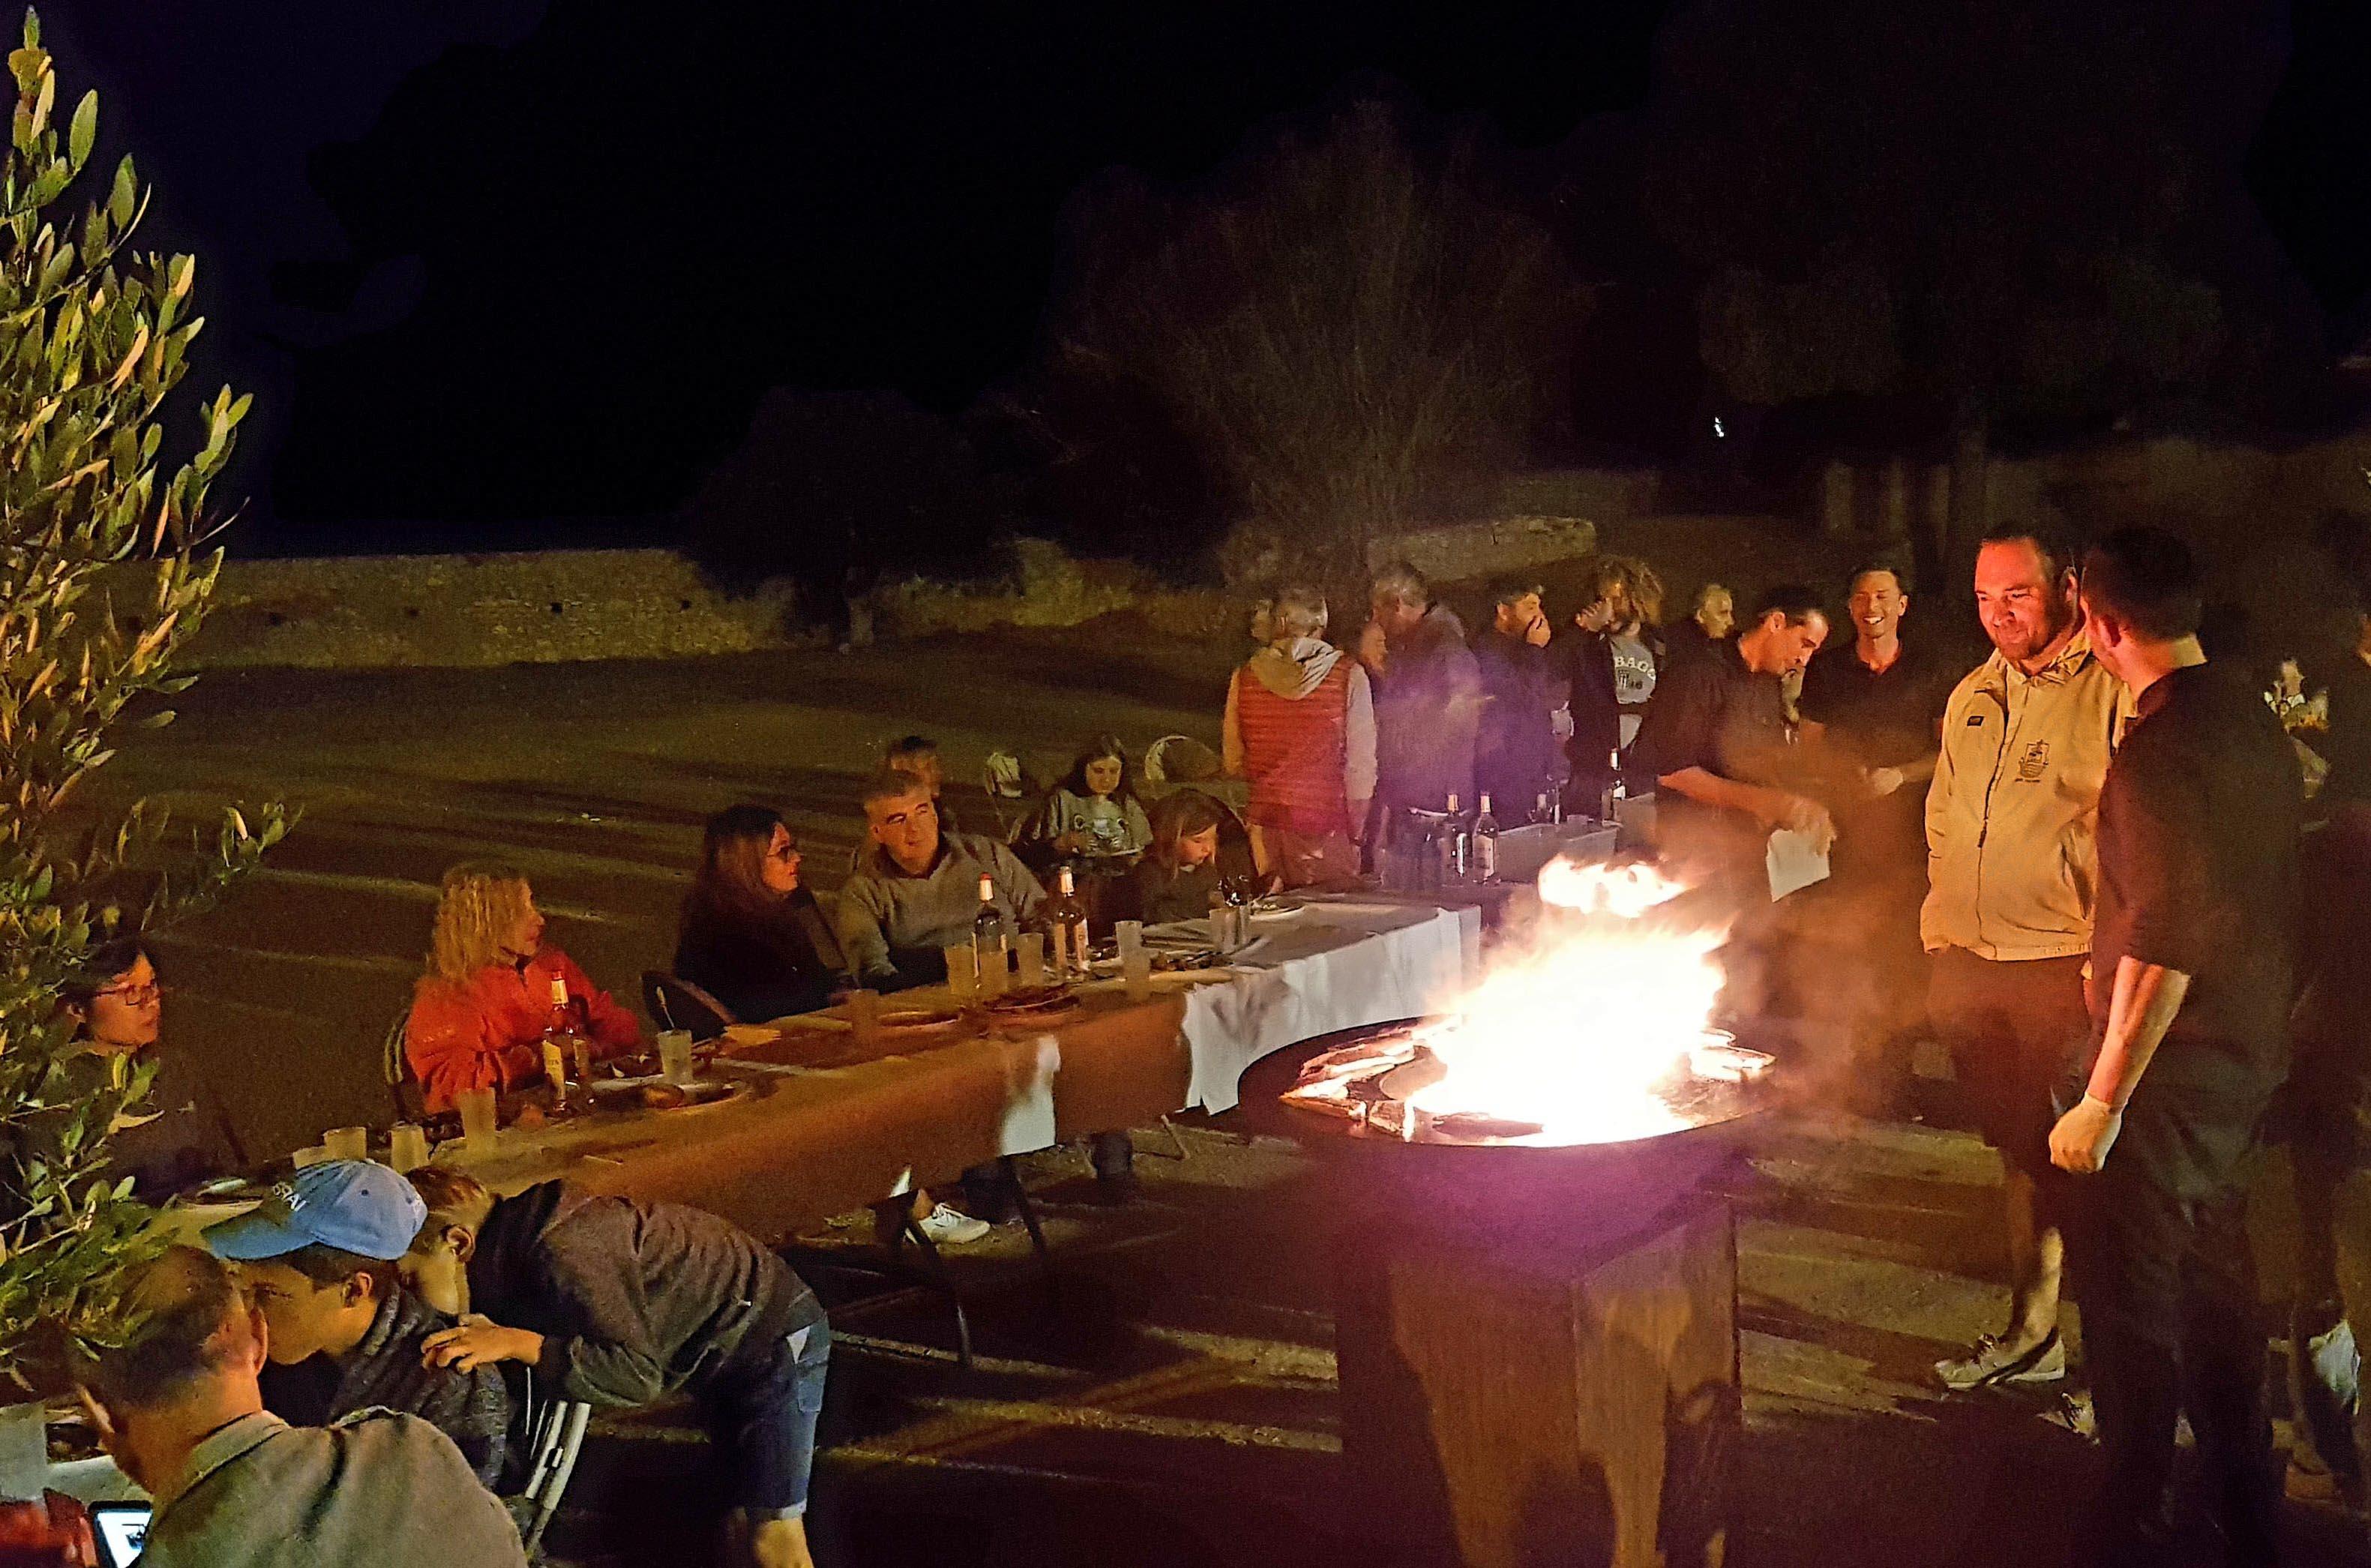 CC 2017 dîner citadelle remise des prix Corsica Classic Rally photo Gerard Wricz